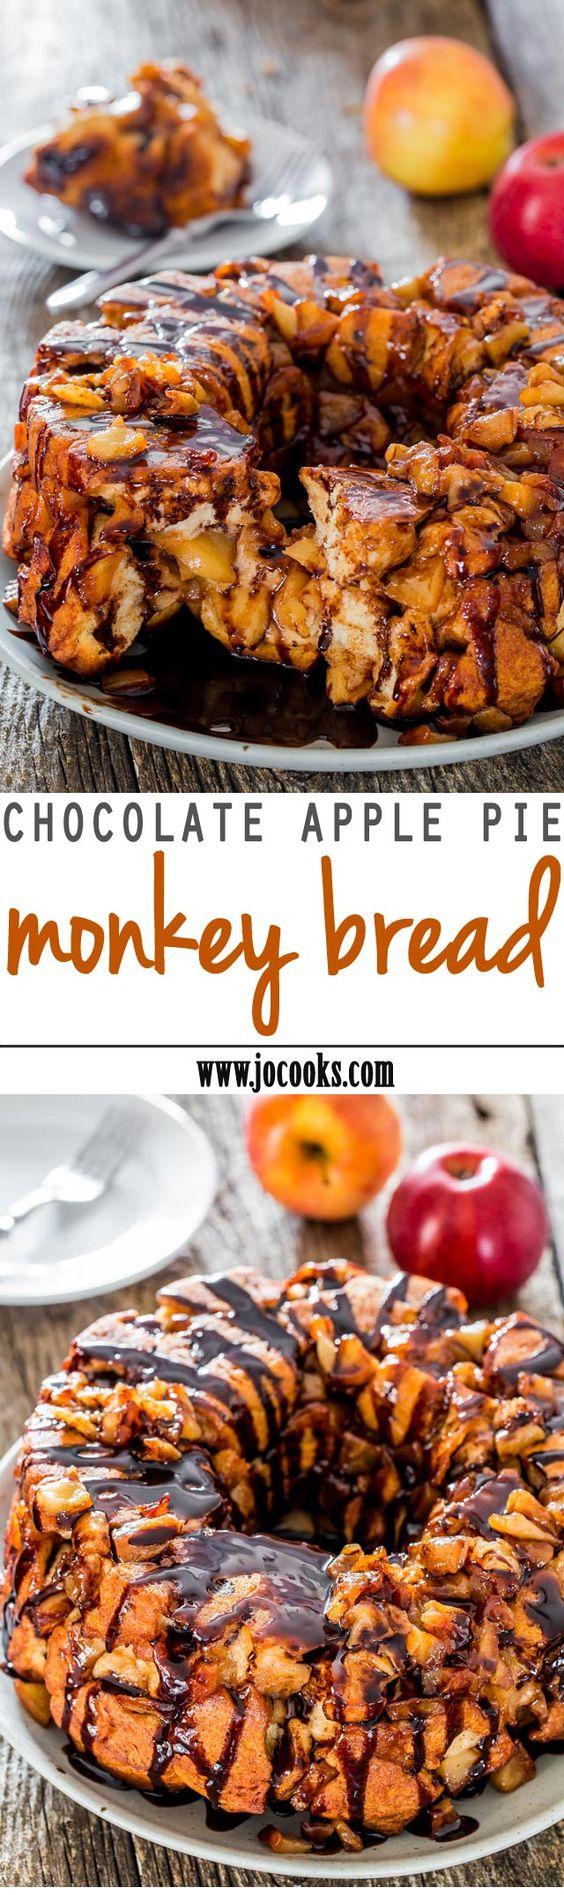 how to make chocolate like apple